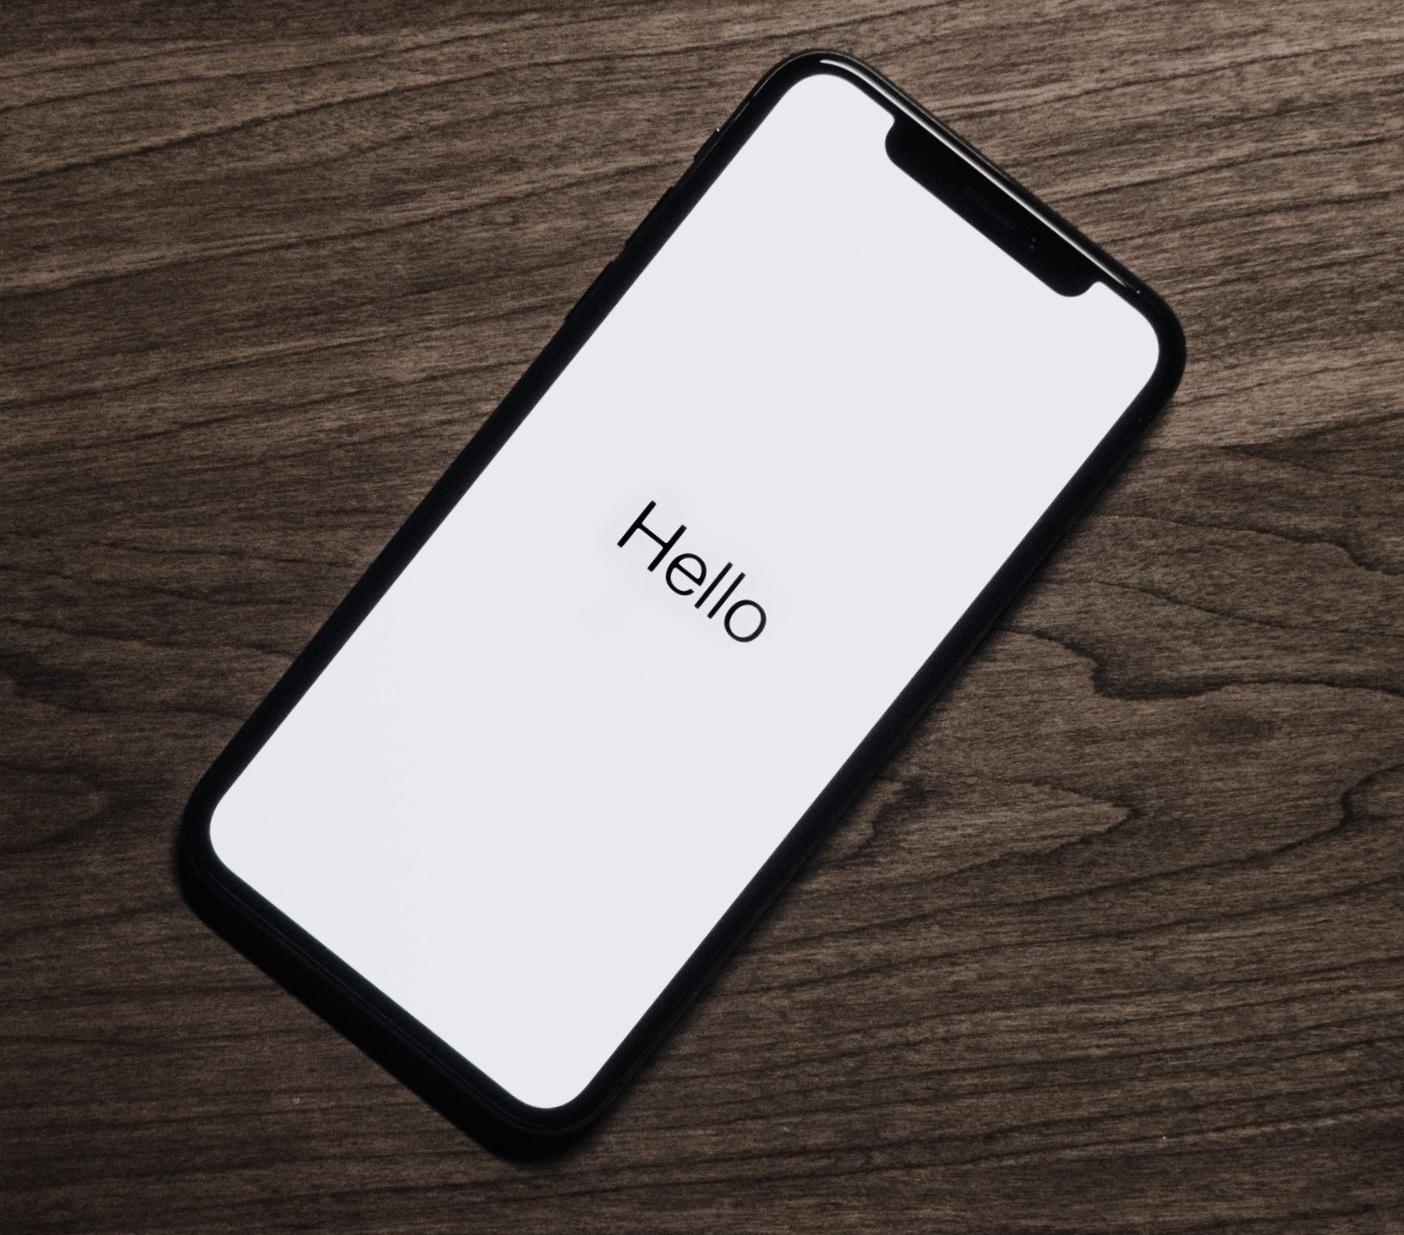 cellphone-device-display-699122.jpg